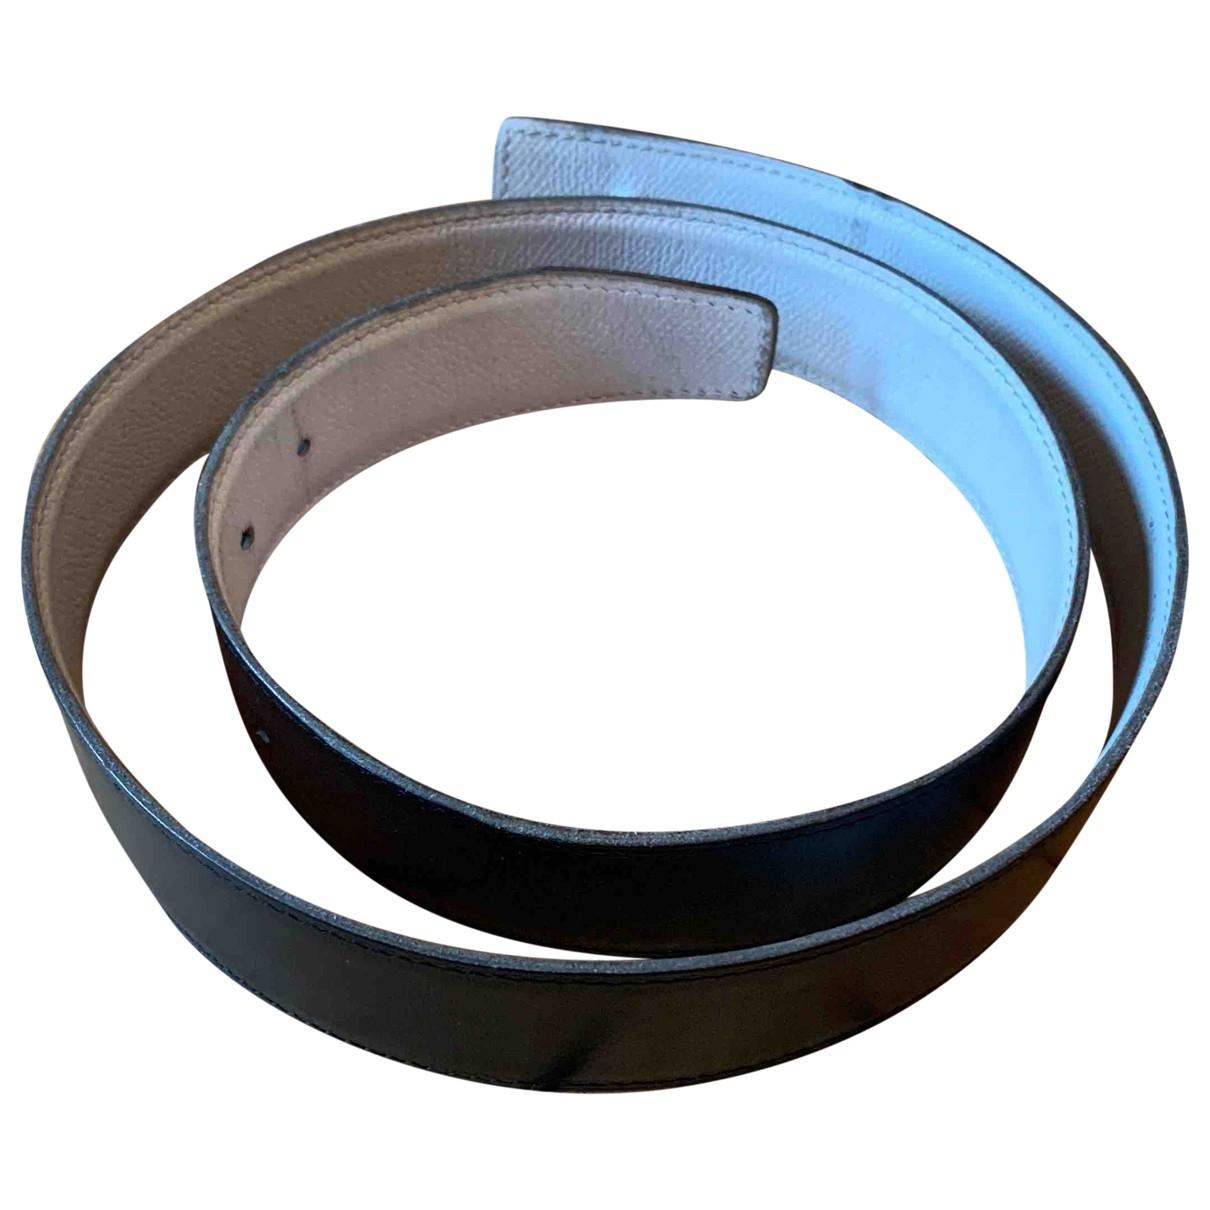 Cinturon Cuir seul / Leather Strap de Cuero Hermes